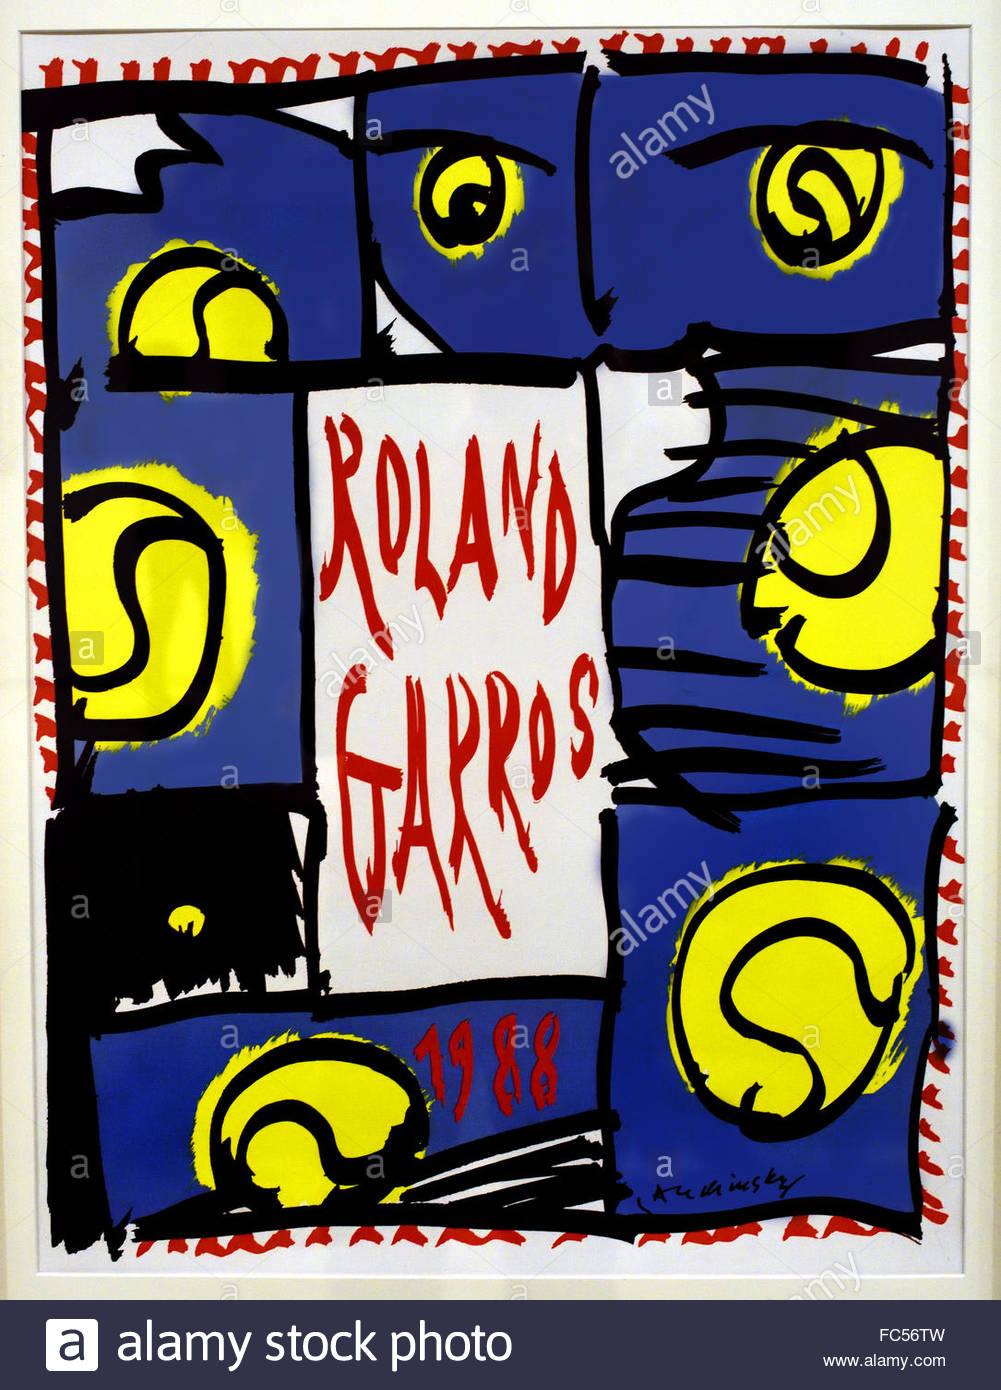 Rolland Garros 1988 Pierre Alechinsky  1927 Belgian Belgium The French Open tennis tournament held over two weeks - Stock Image